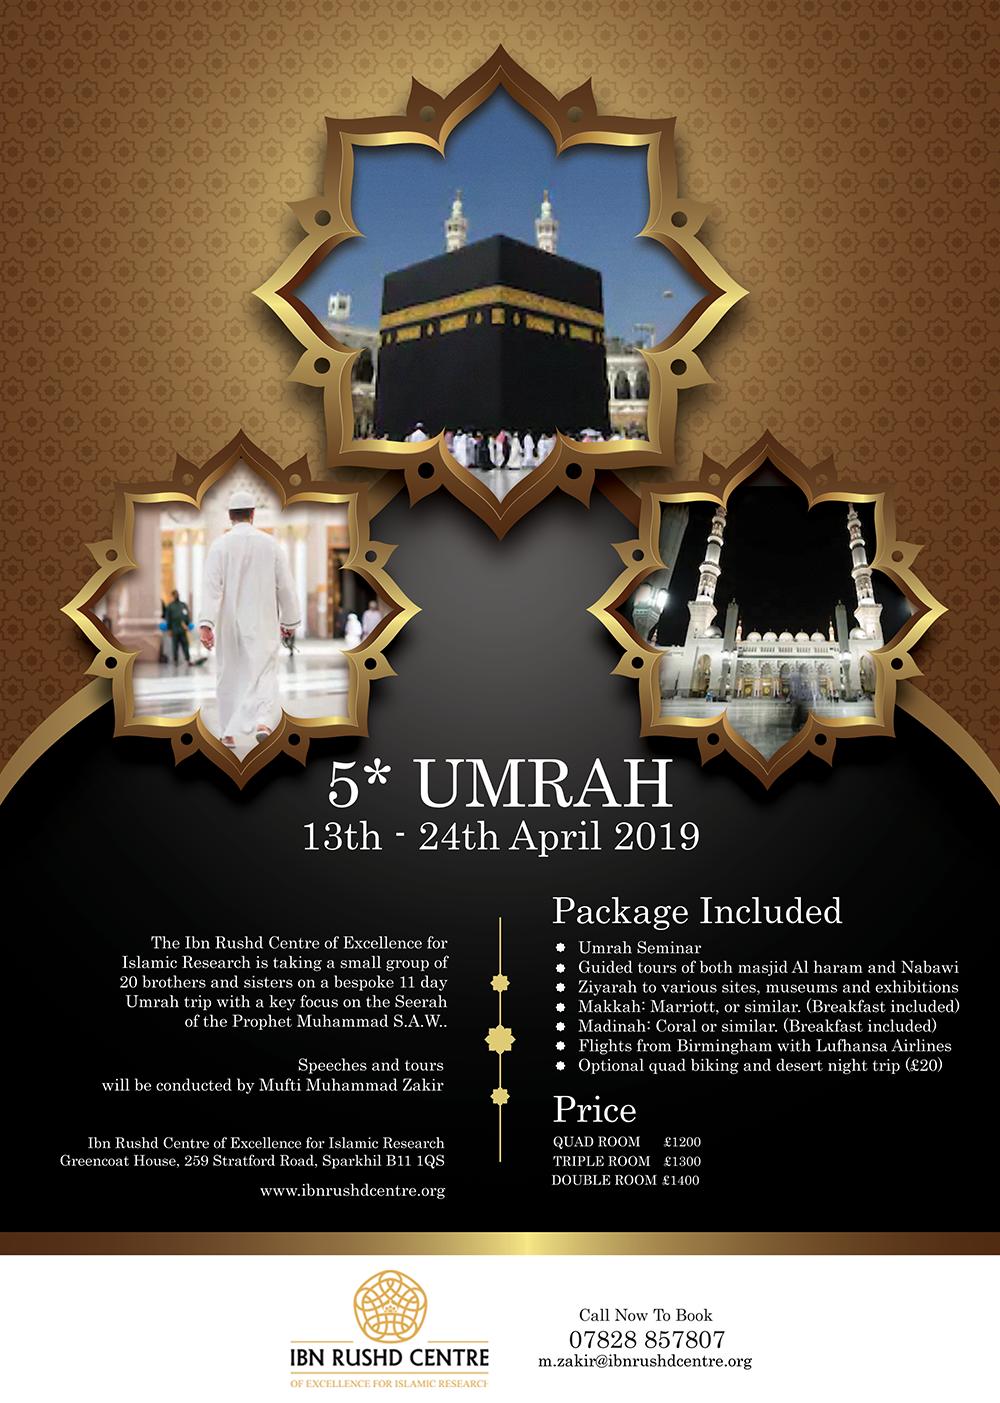 5* Umrah Package